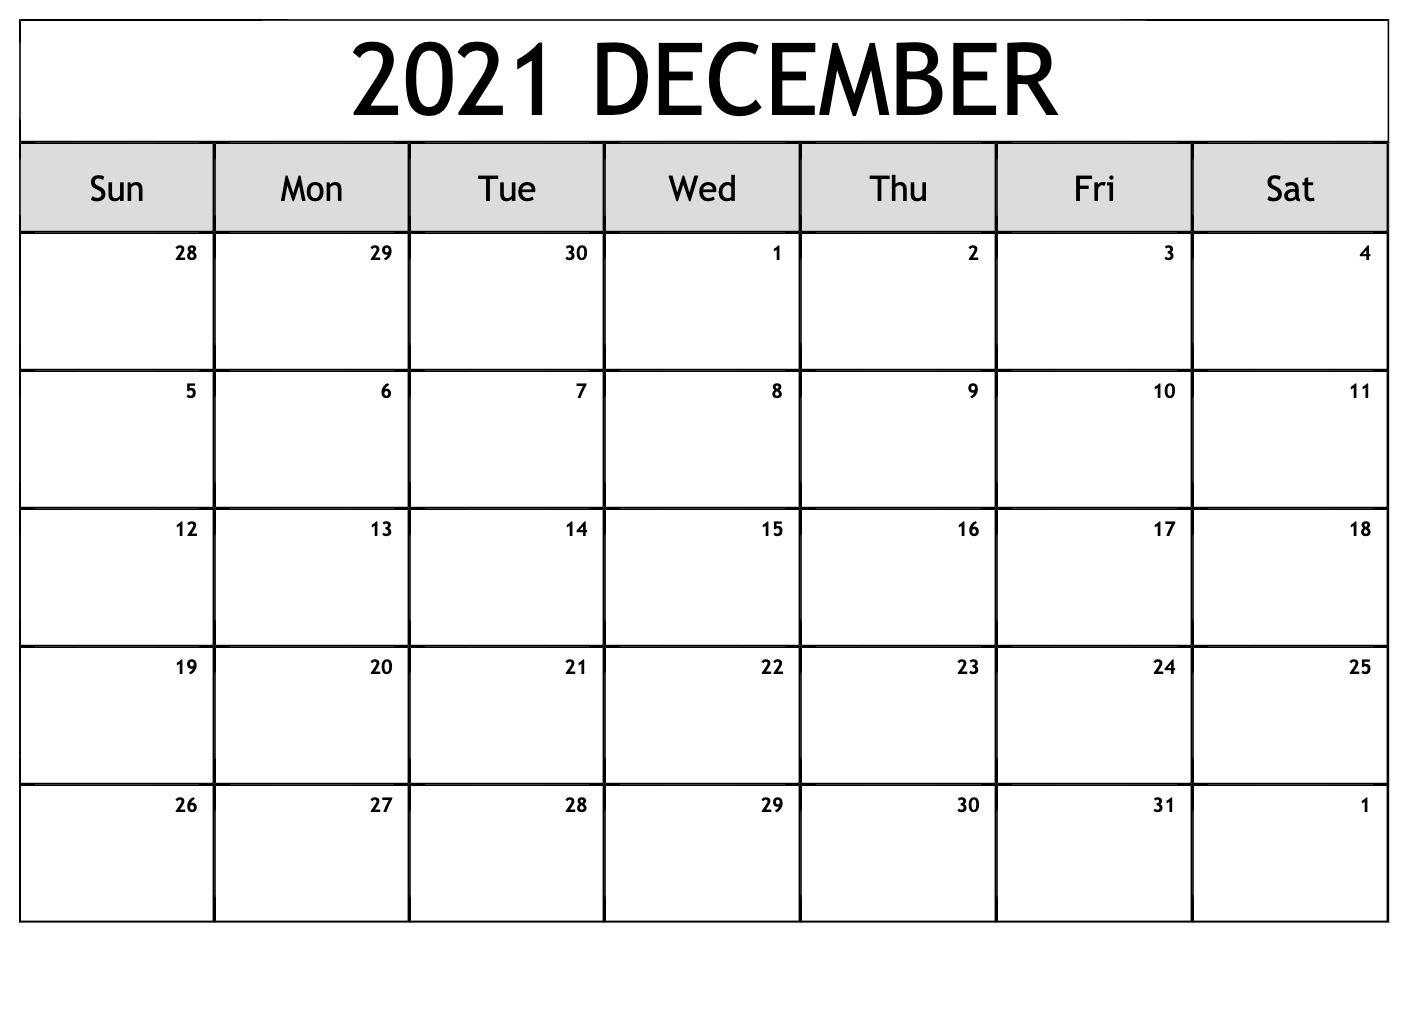 December 2021 Calendar With Holidays South Africa